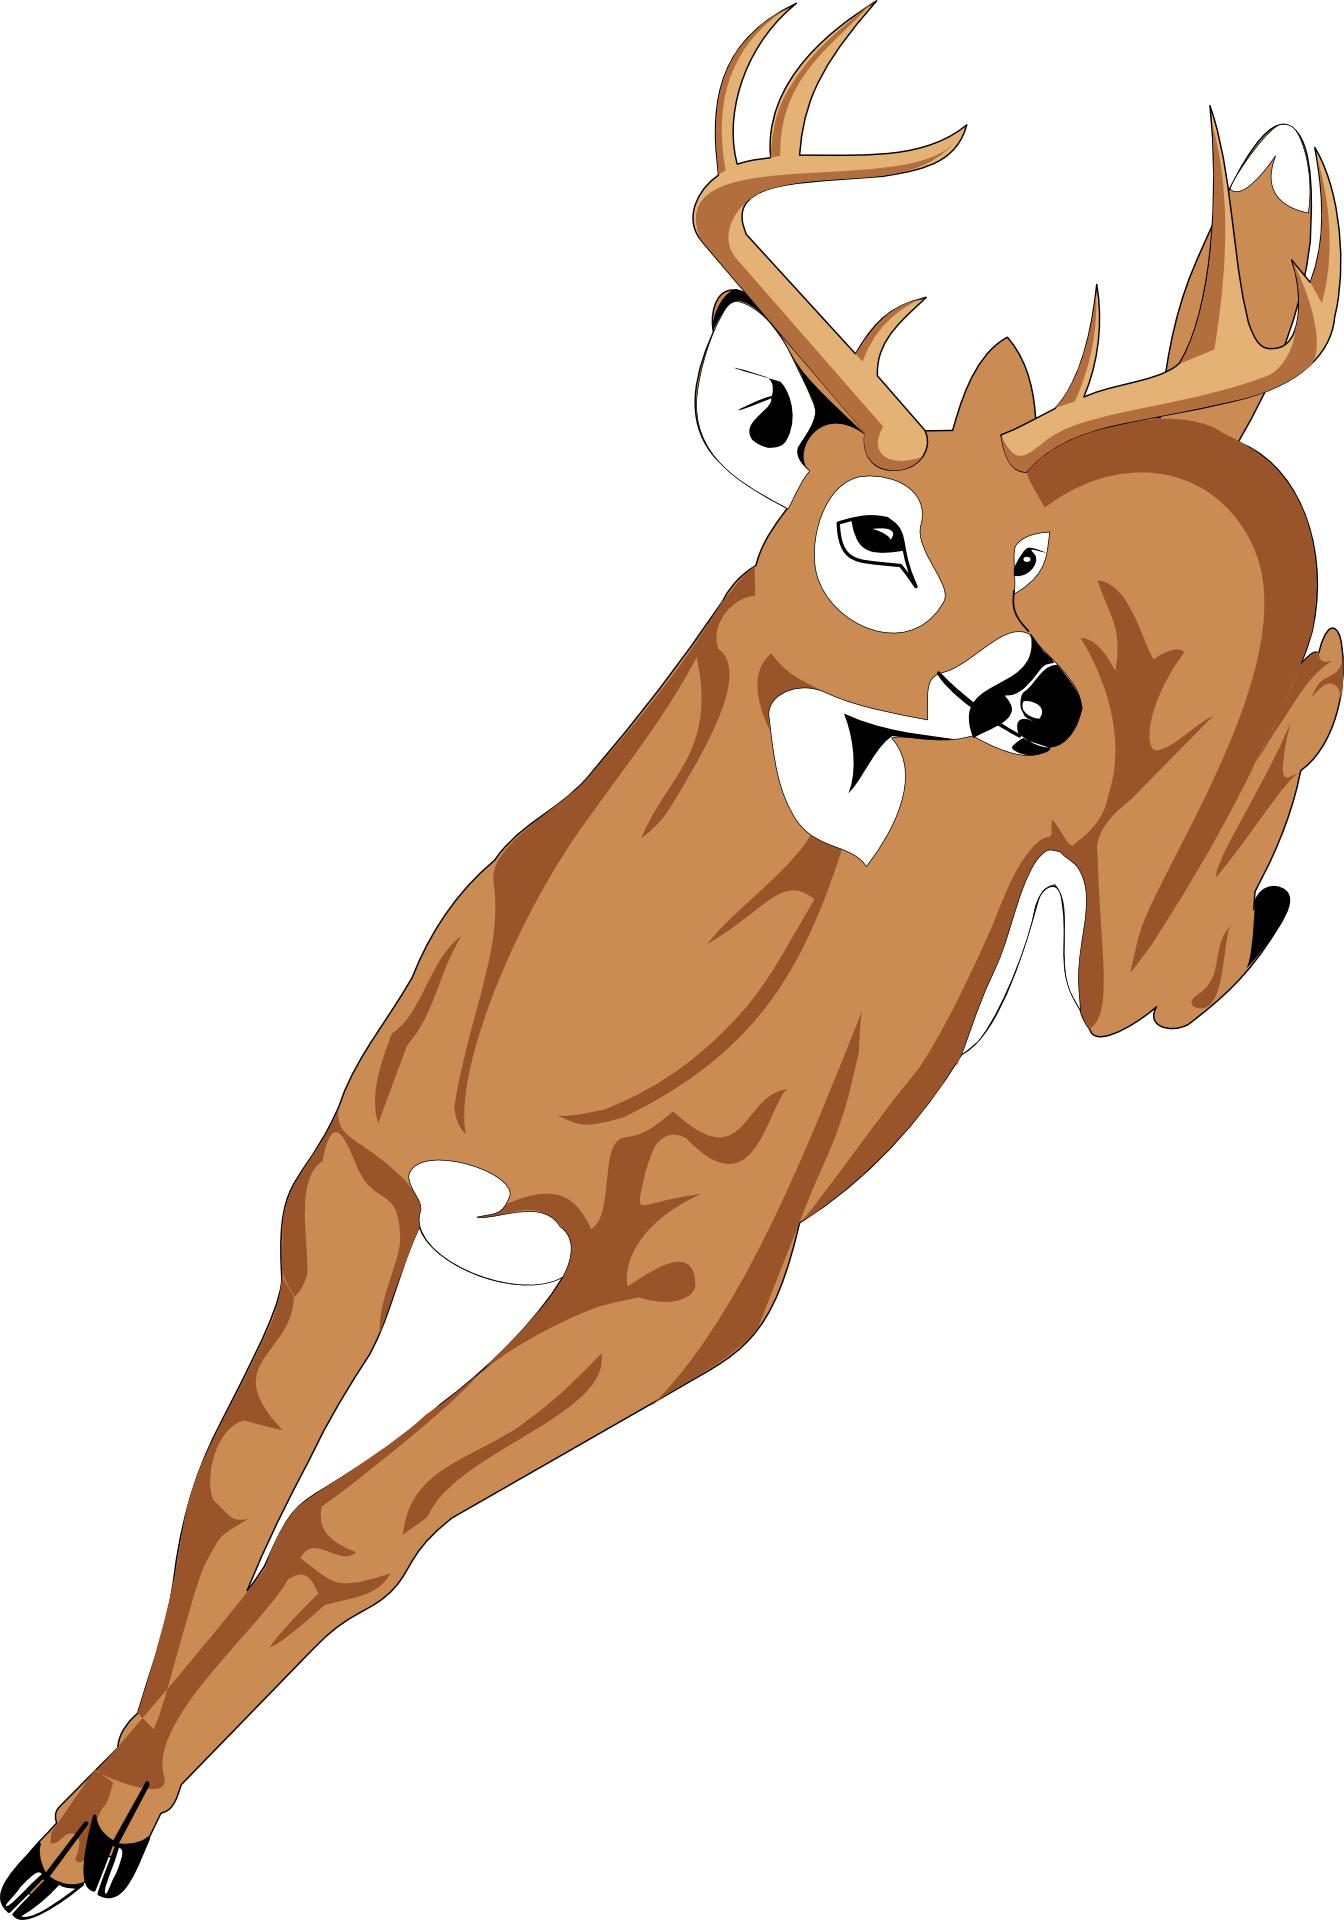 cartoon animal-running deer vectorcartoon animal-running deer vector